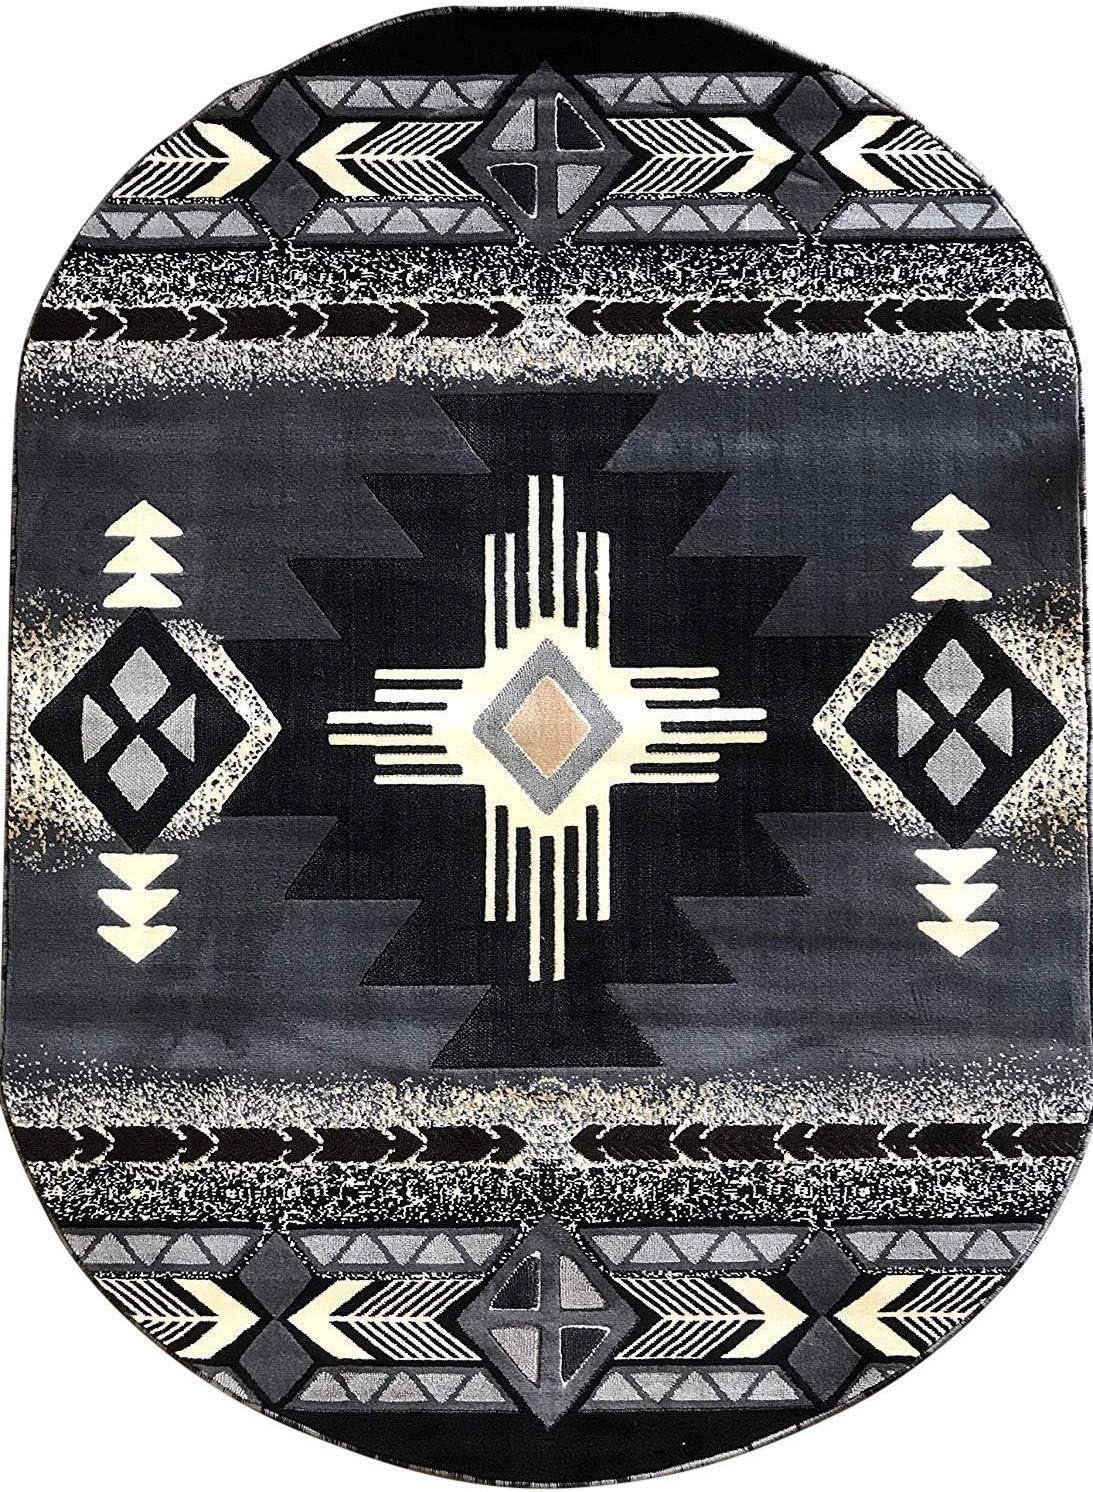 Champion Rugs Popular product Southwest Navajo Aztec Native American Gray Tribal Cheap SALE Start